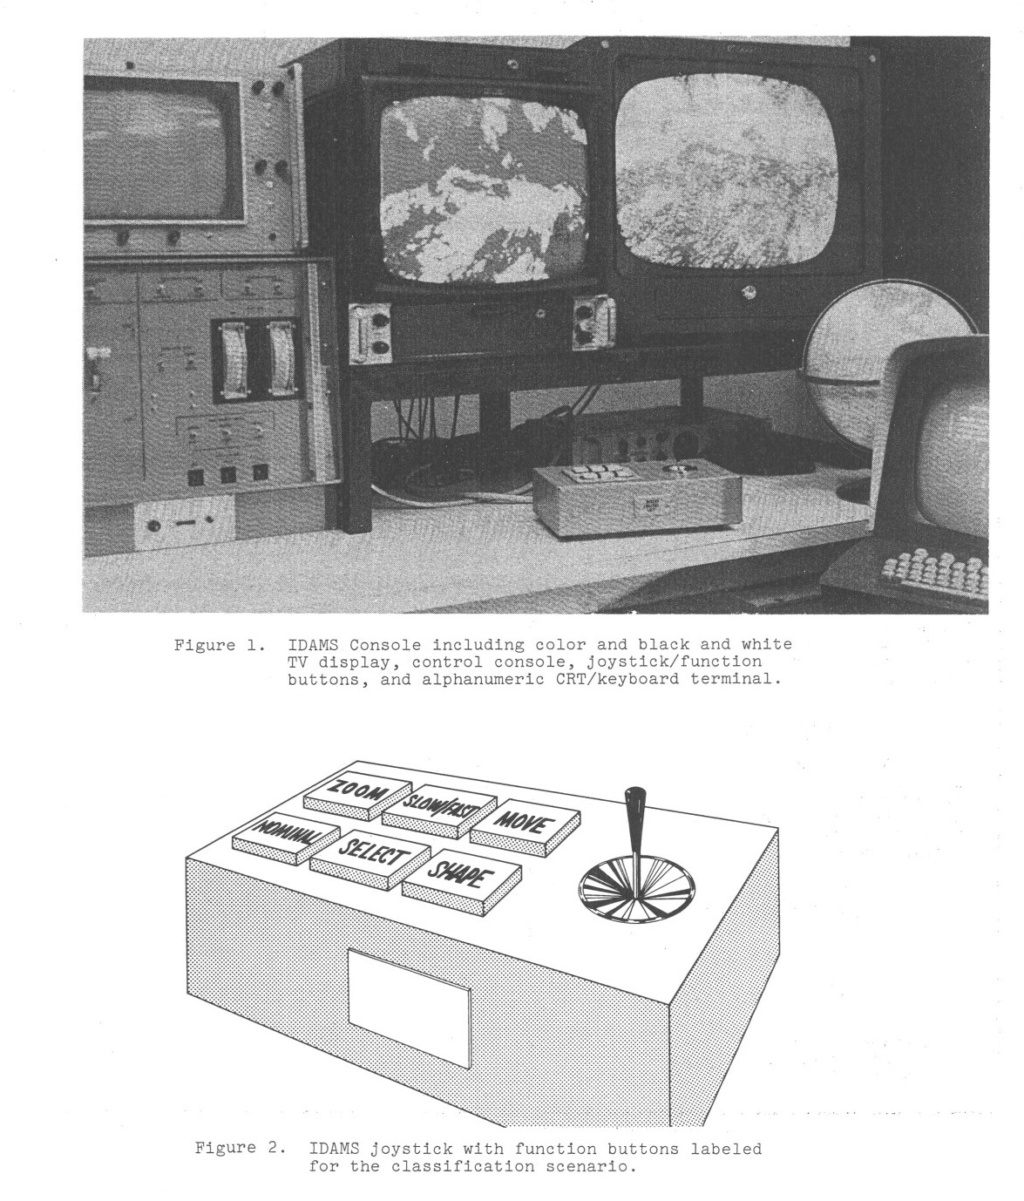 Early Digital Image Processing  00-ida10